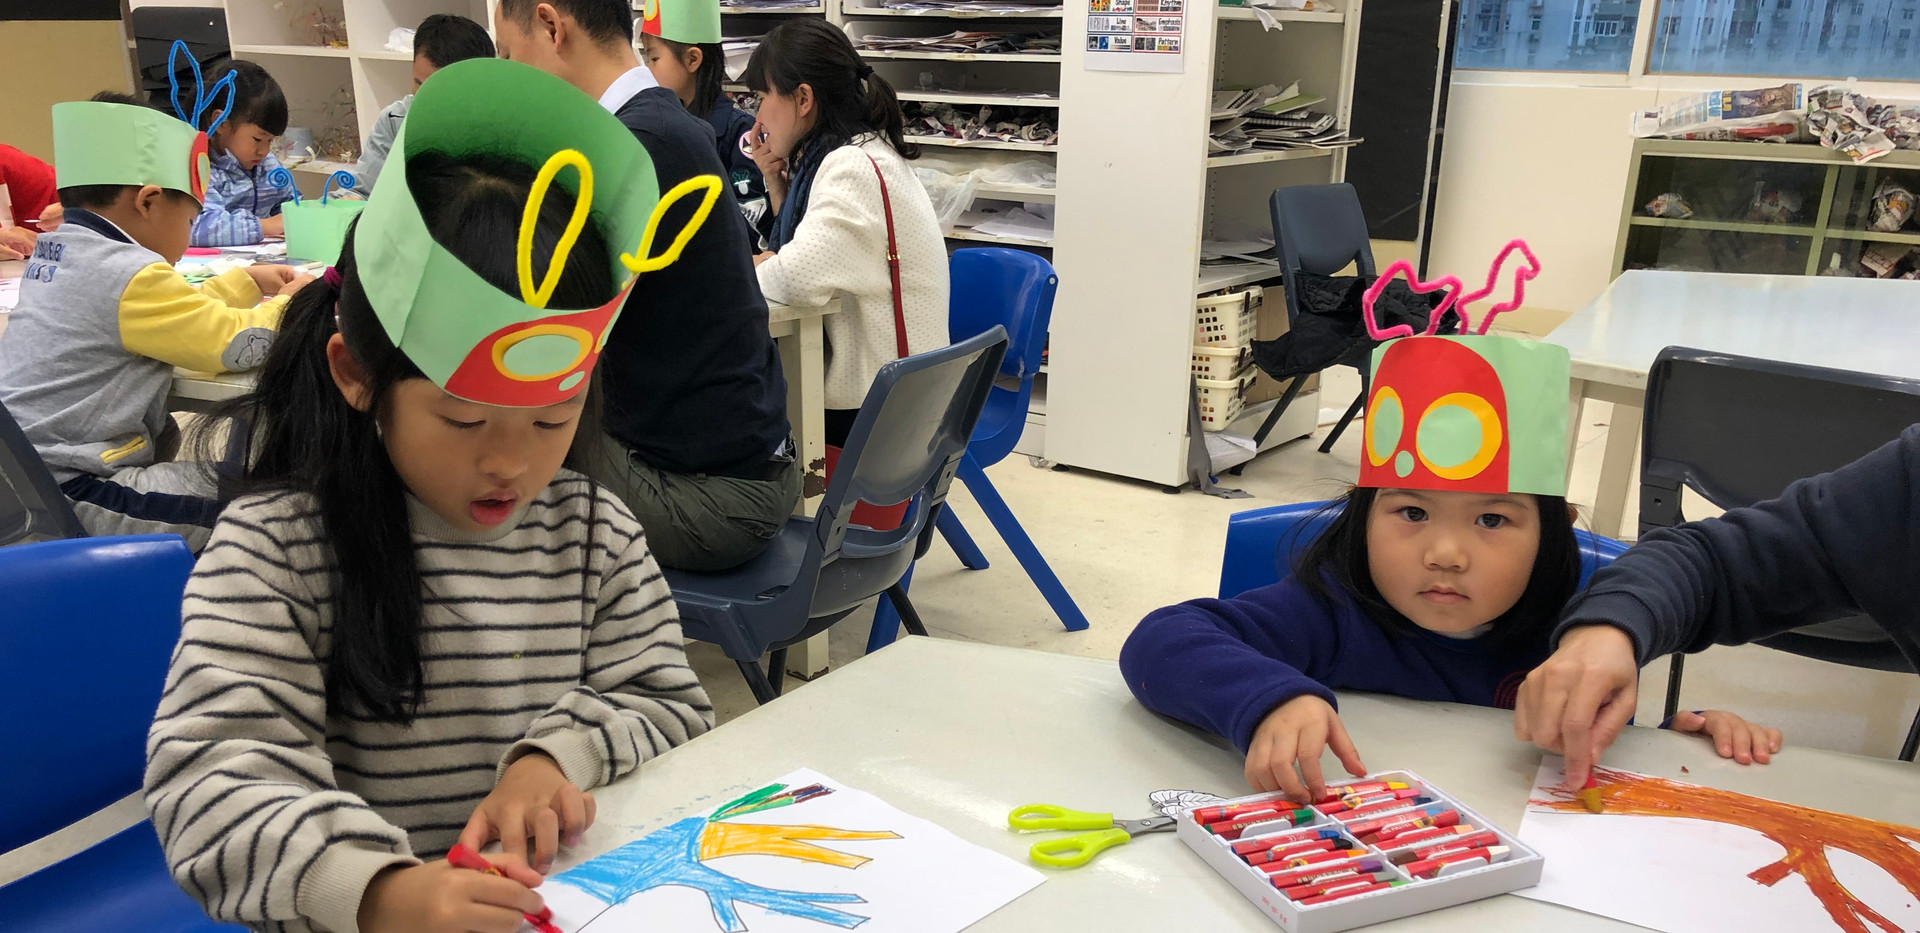 Family Fun Art Workshop 親子創意藝術工作坊